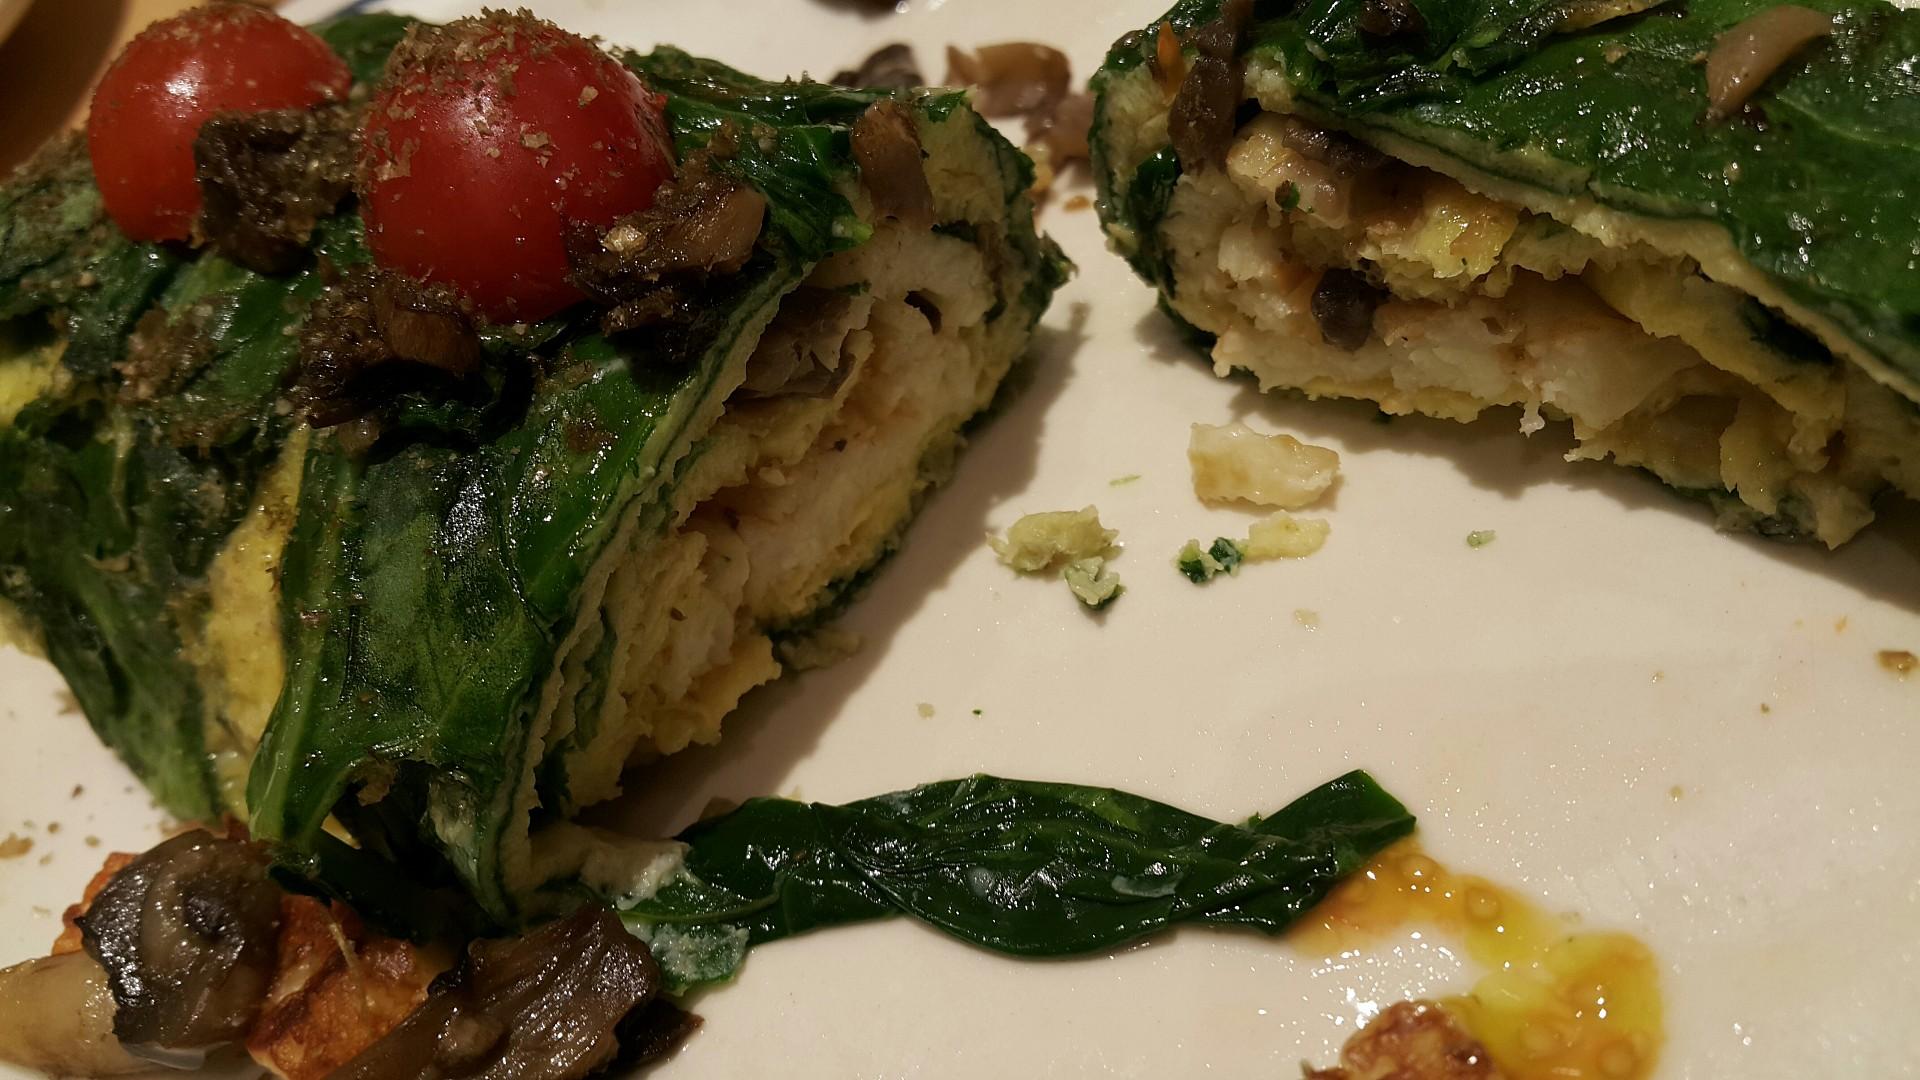 Spinach egg with halloumi cheese @ IHOP - Bahrain